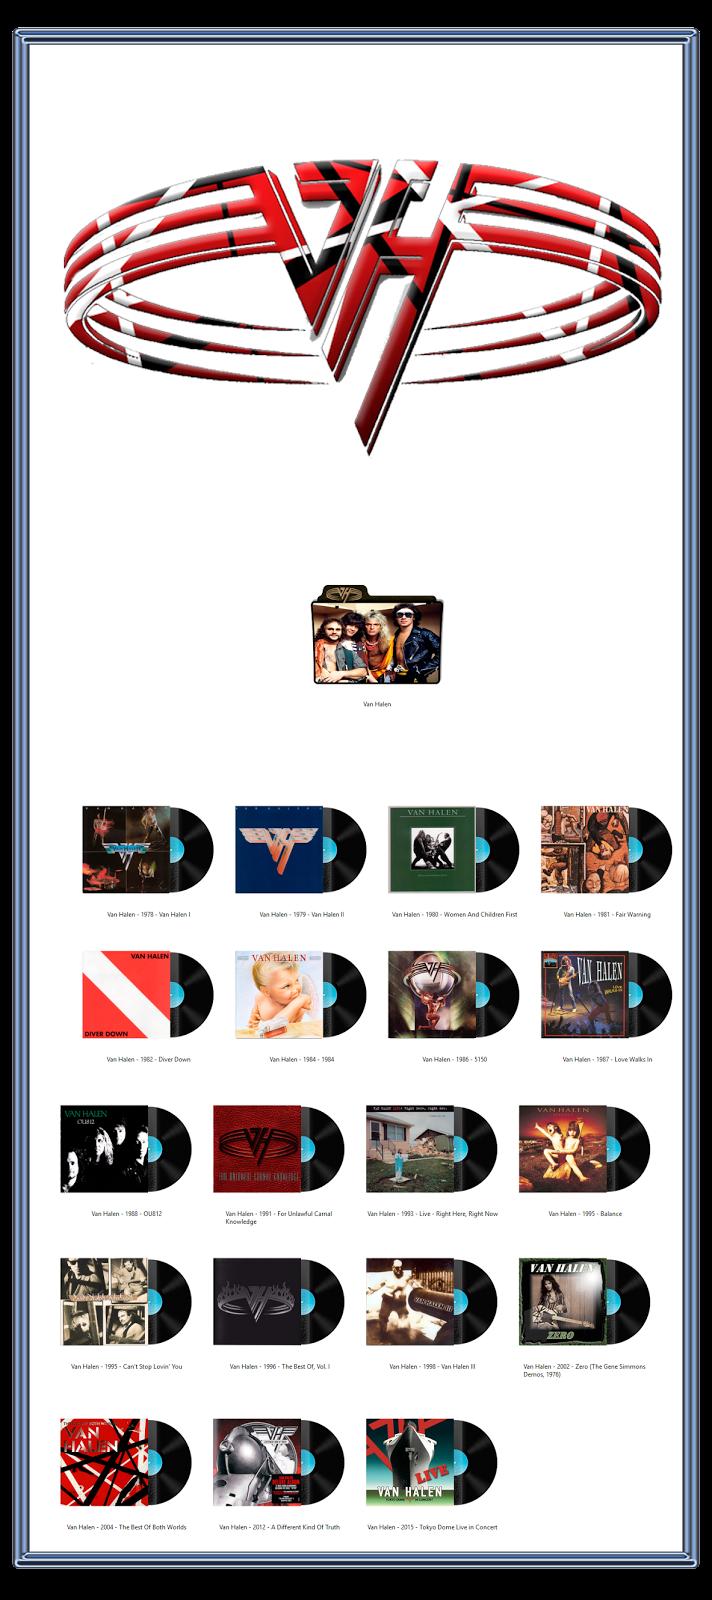 Album Art Icons Van Halen Discography Icons Ico Png Van Halen Van Halen Album Covers Rock Band Posters